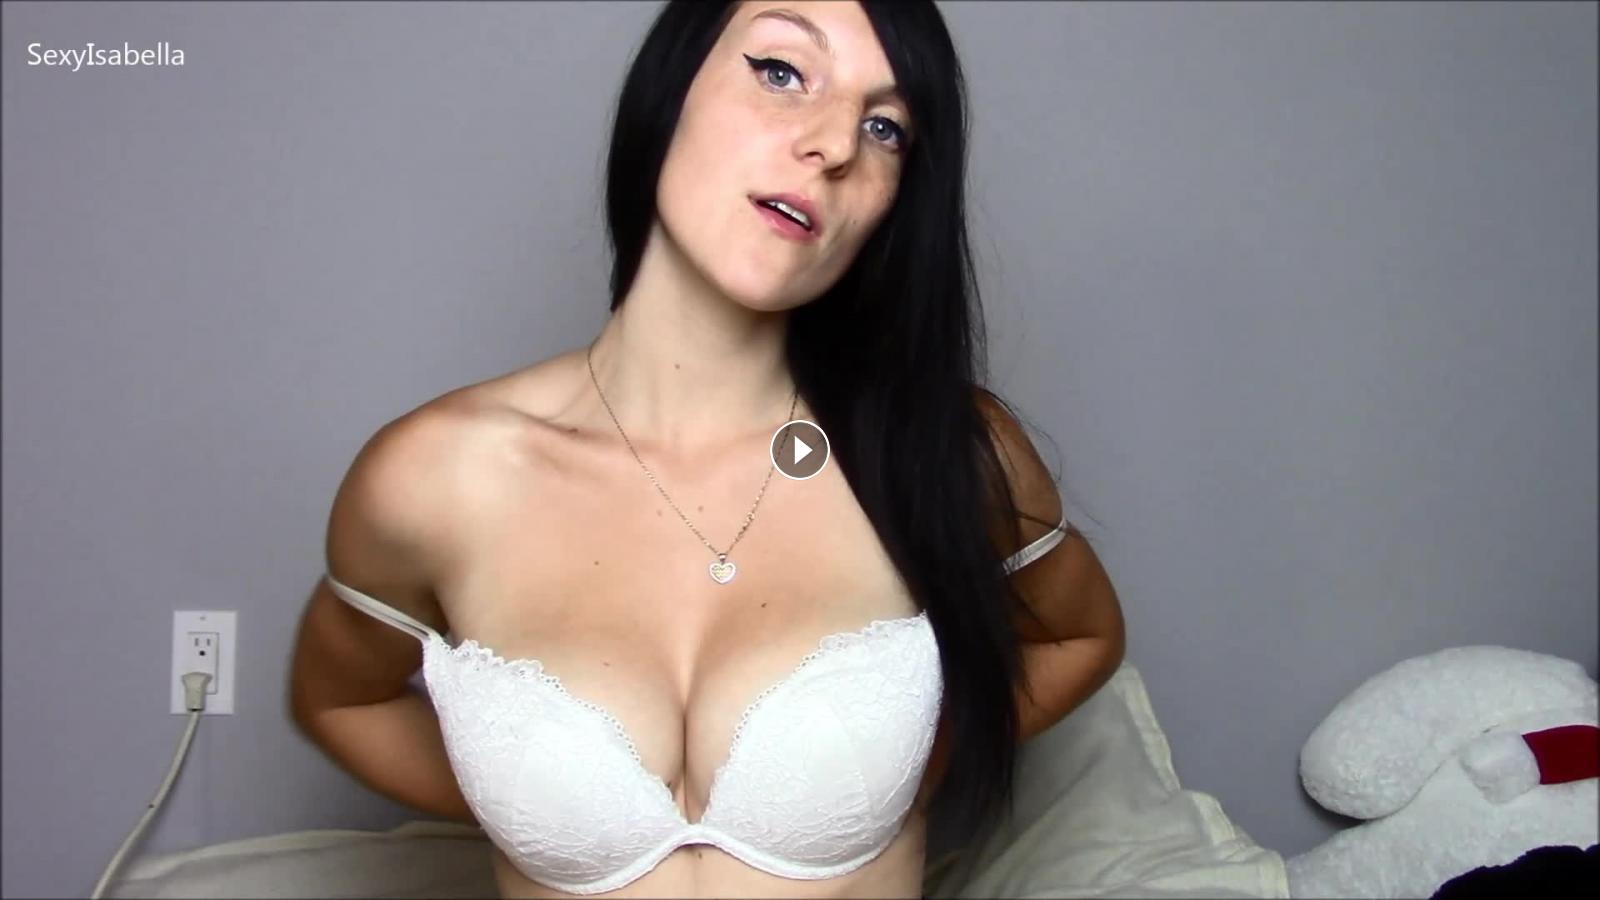 Sexyisabella7